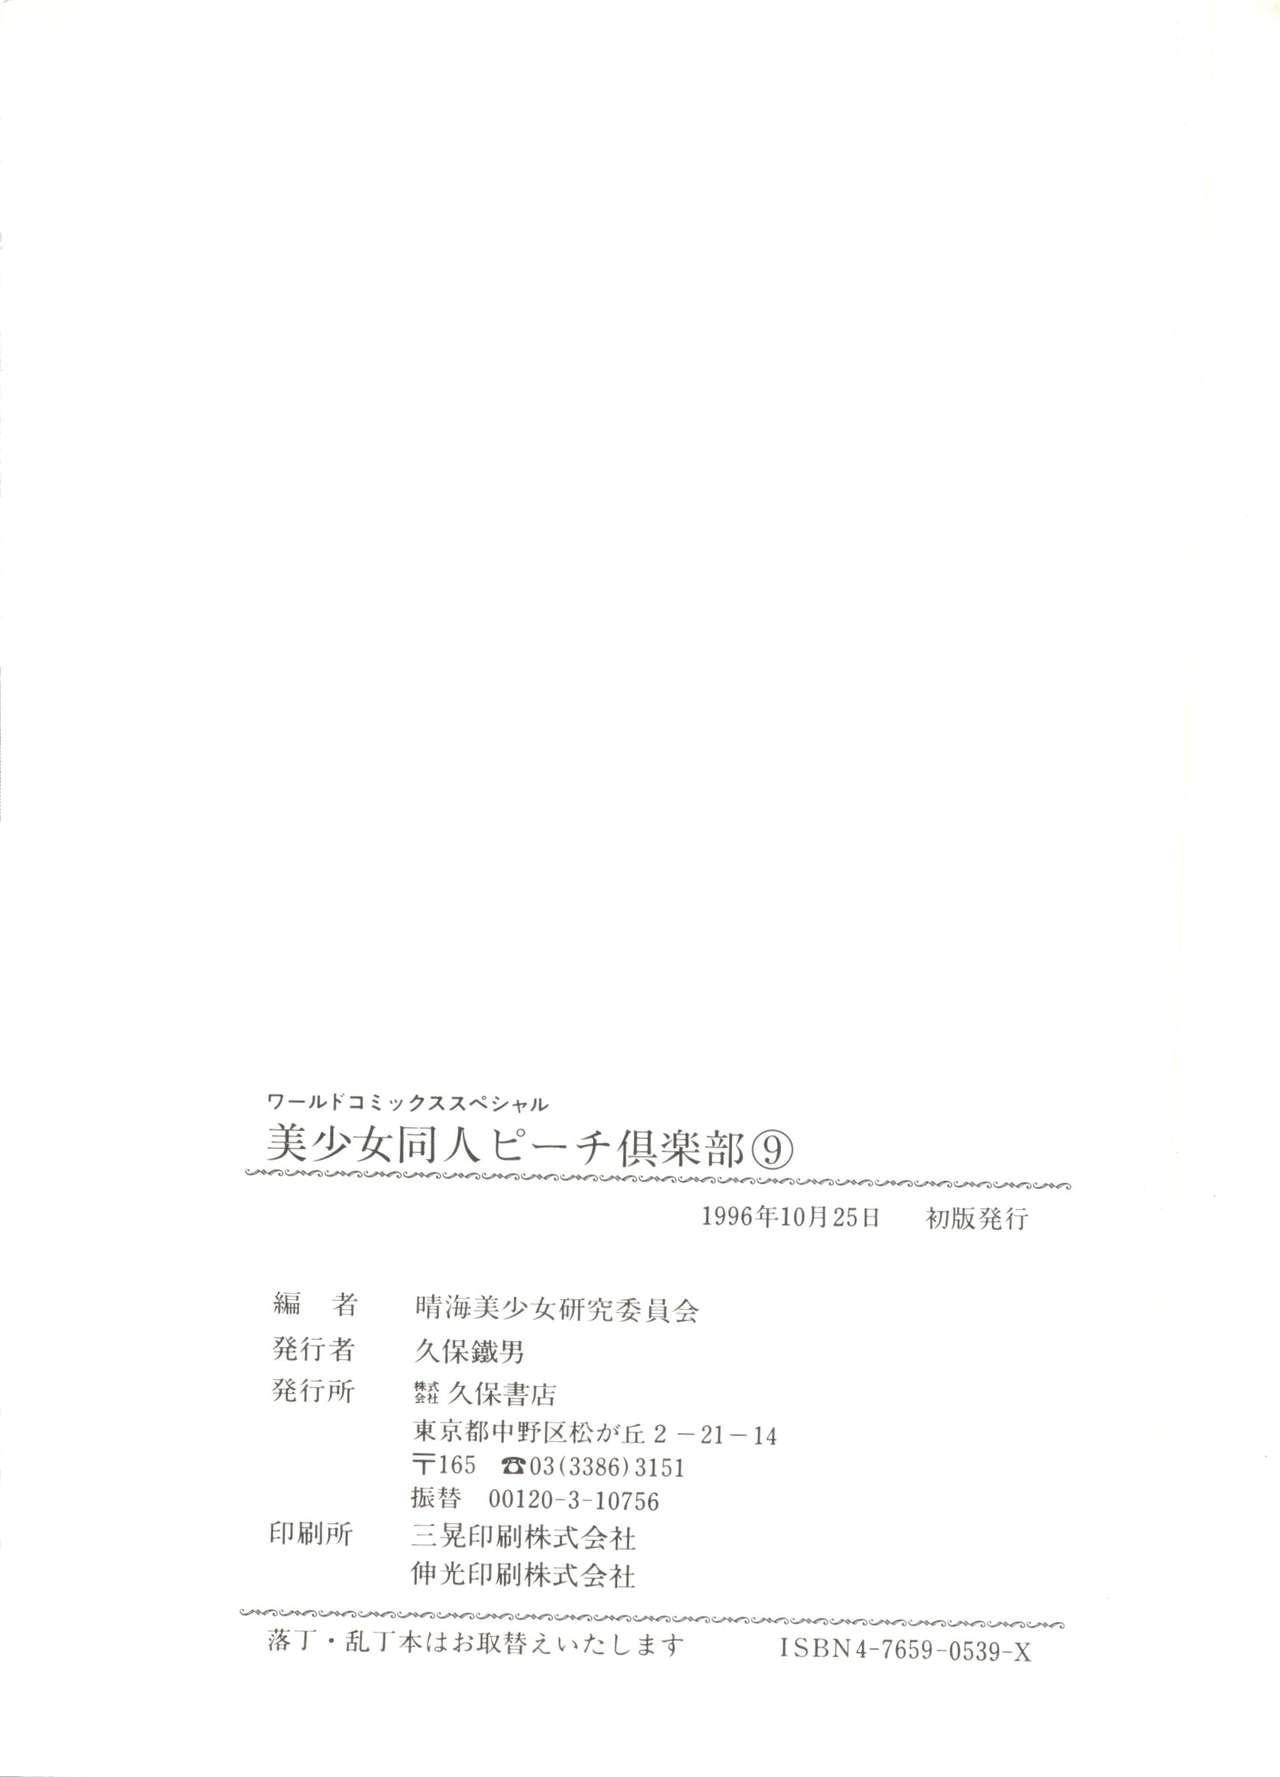 Bishoujo Doujin Peach Club - Pretty Gal's Fanzine Peach Club 9 143